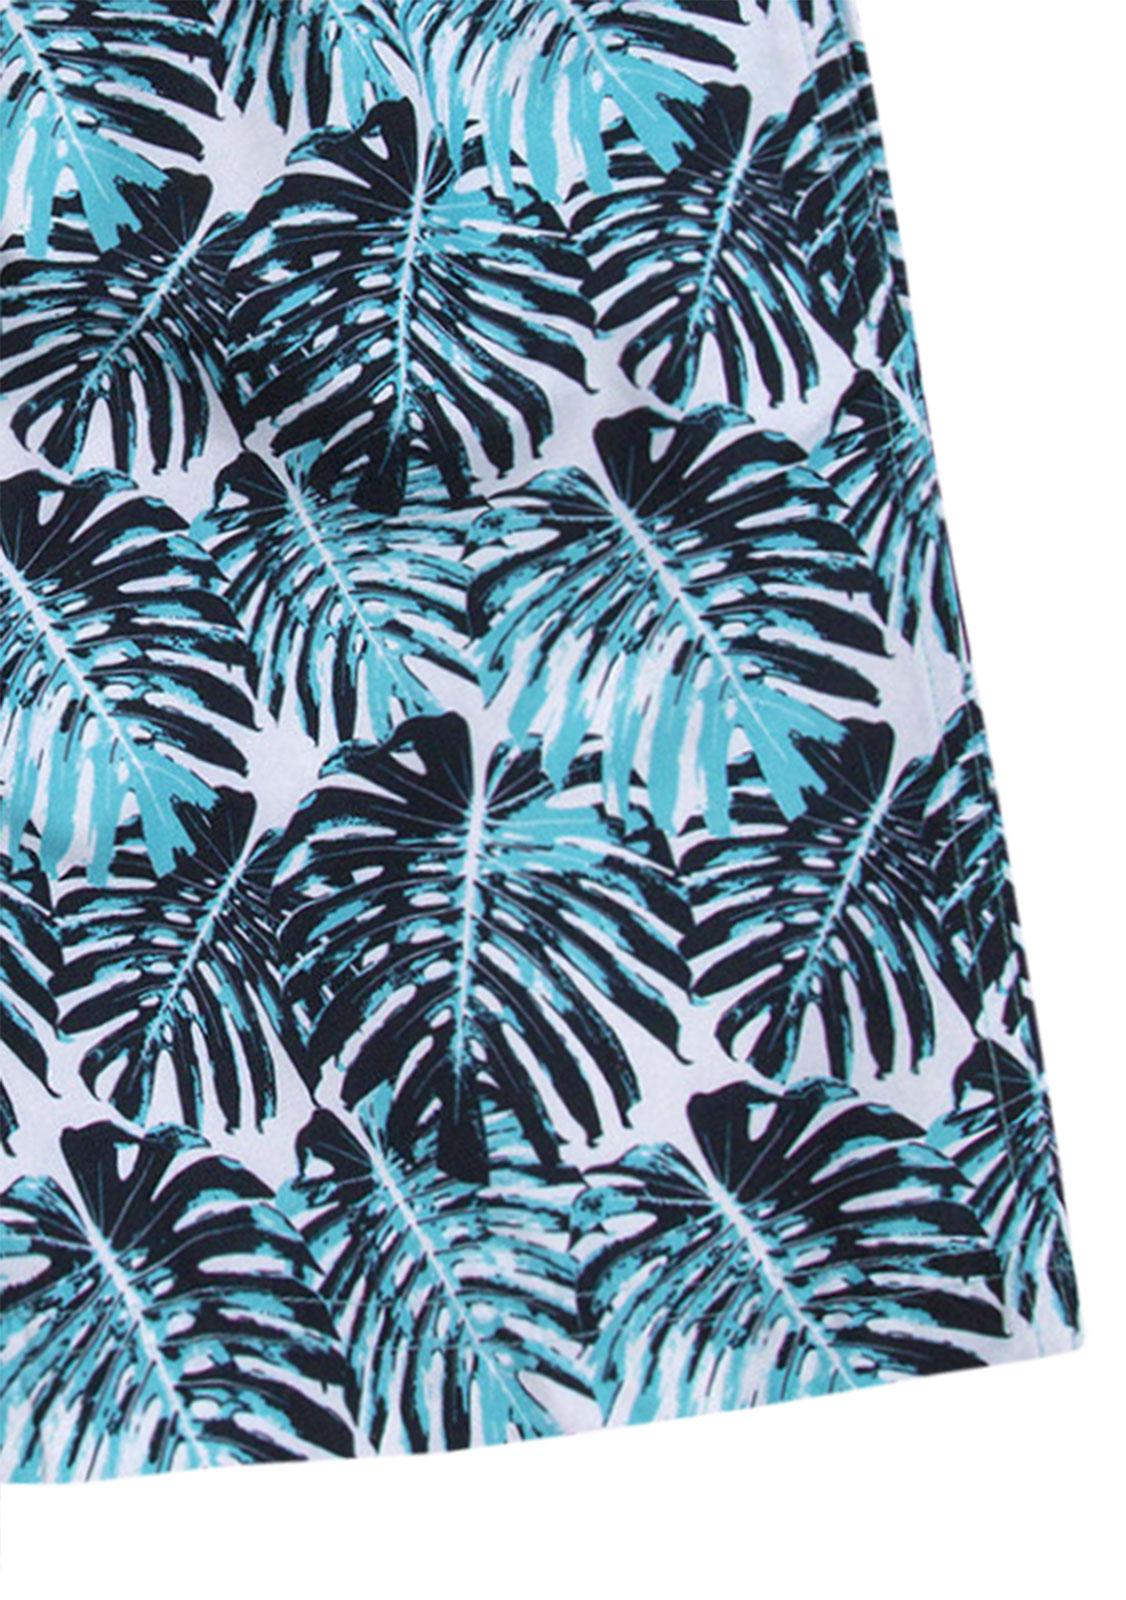 Boys-Swimming-Shorts-Kids-Bermuda-Holiday-Trunks-2-3-4-5-6-7-8-9-10-11-12-13-Yrs thumbnail 4